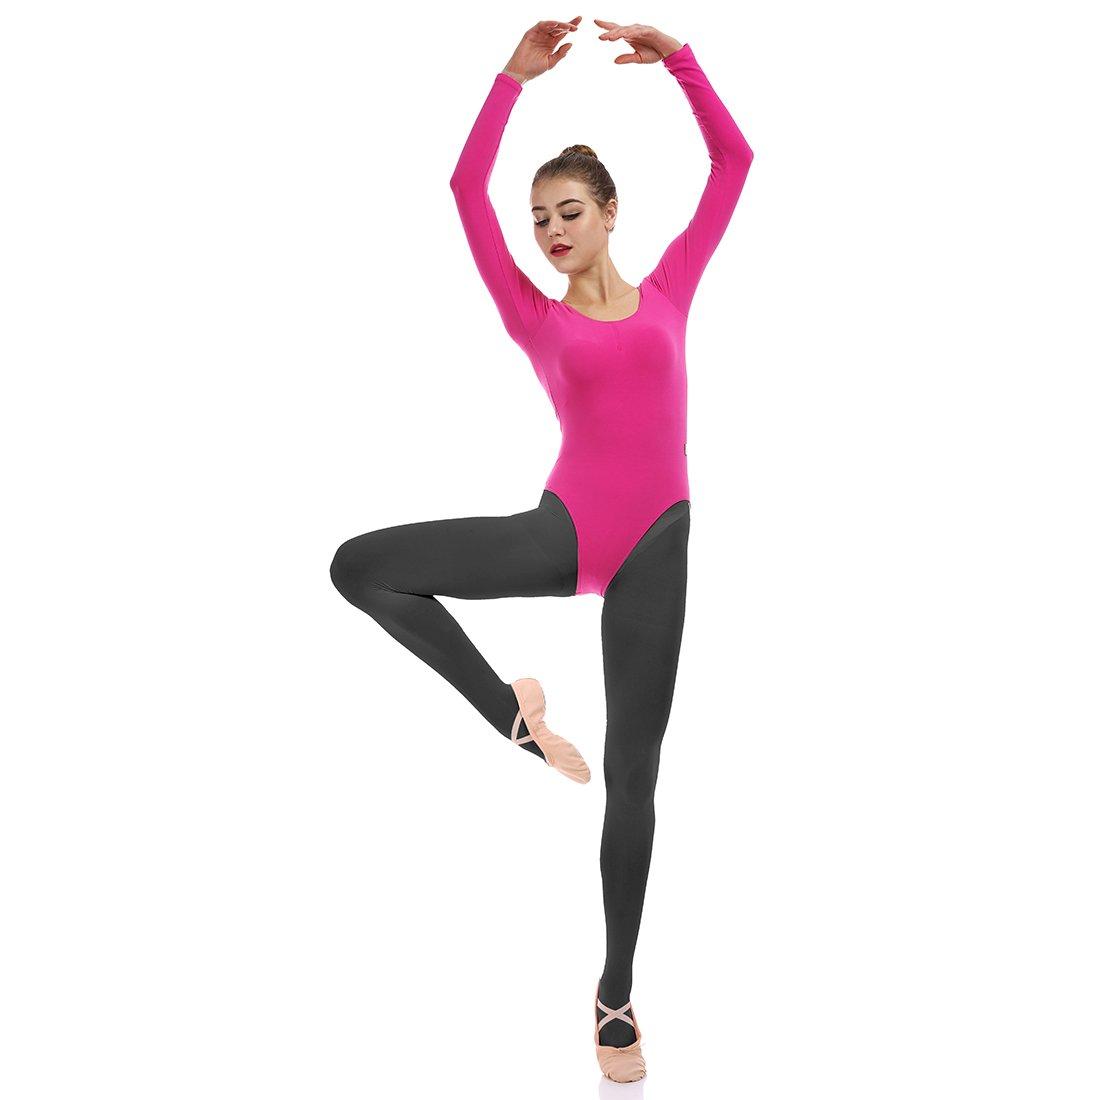 Velet Convertible Ballerina Dancing Stockings iMucci Ballet Dance Tights